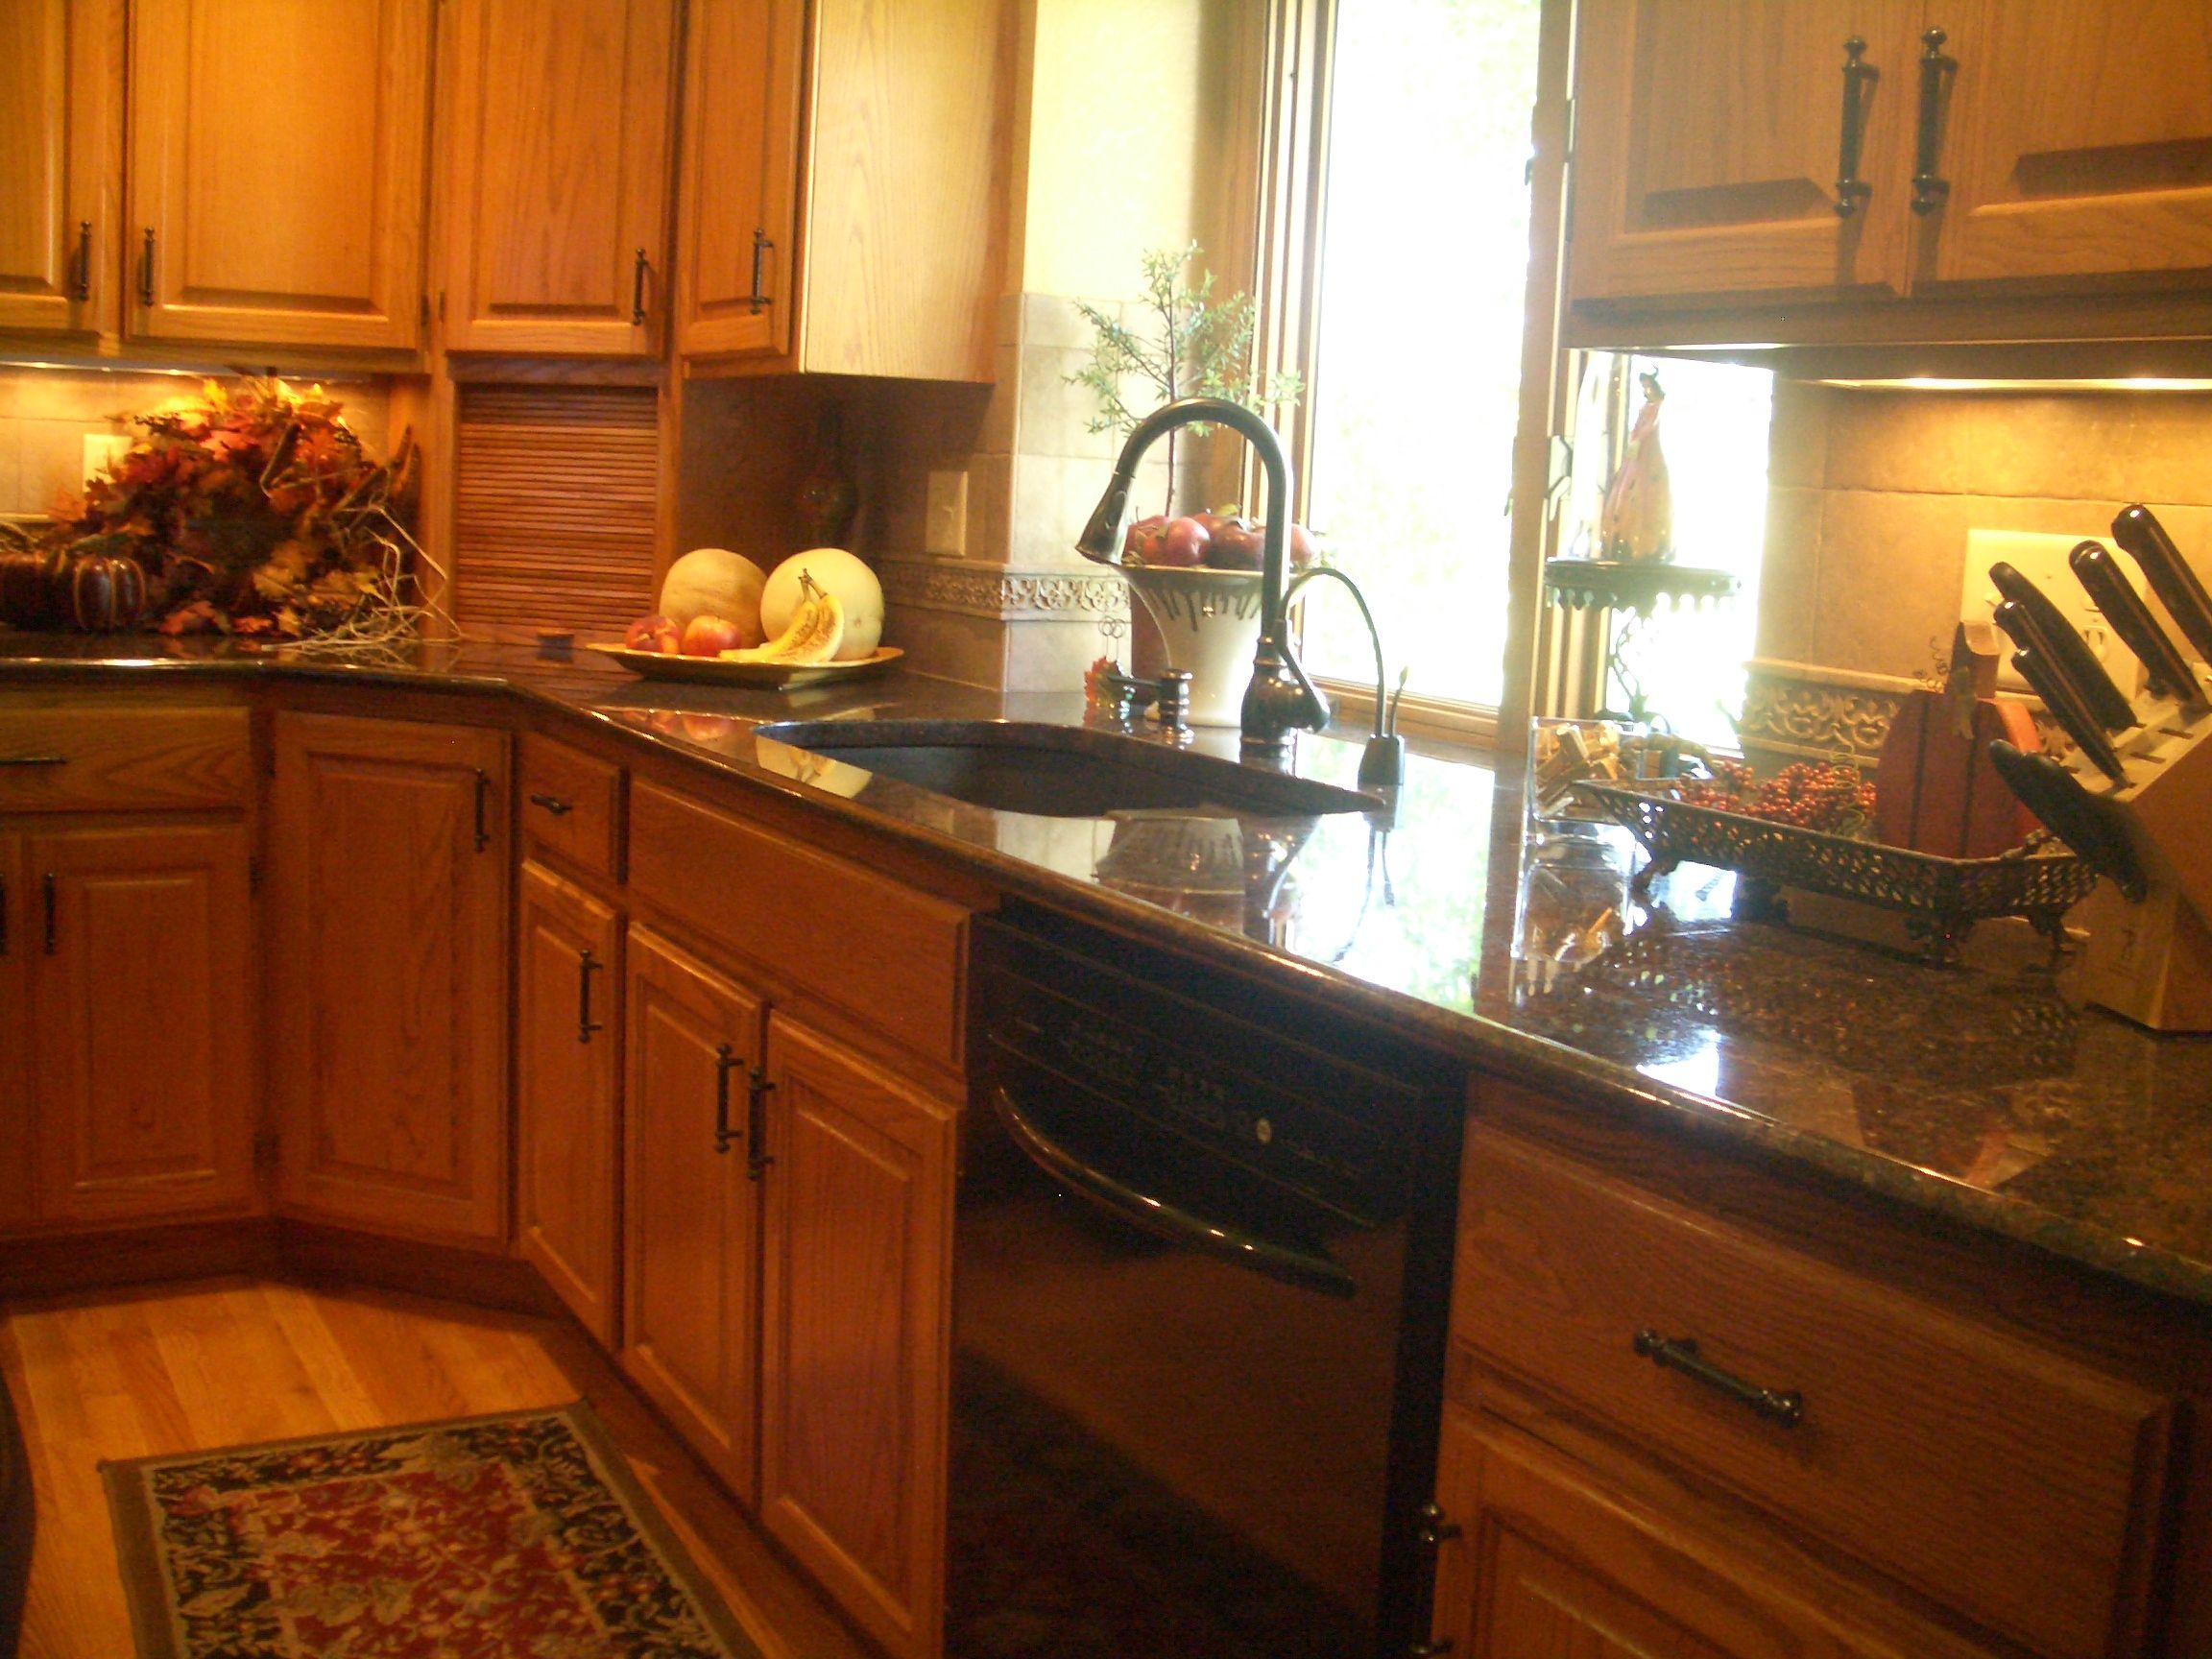 Travertine Kitchen Backsplash With Granite Countertops